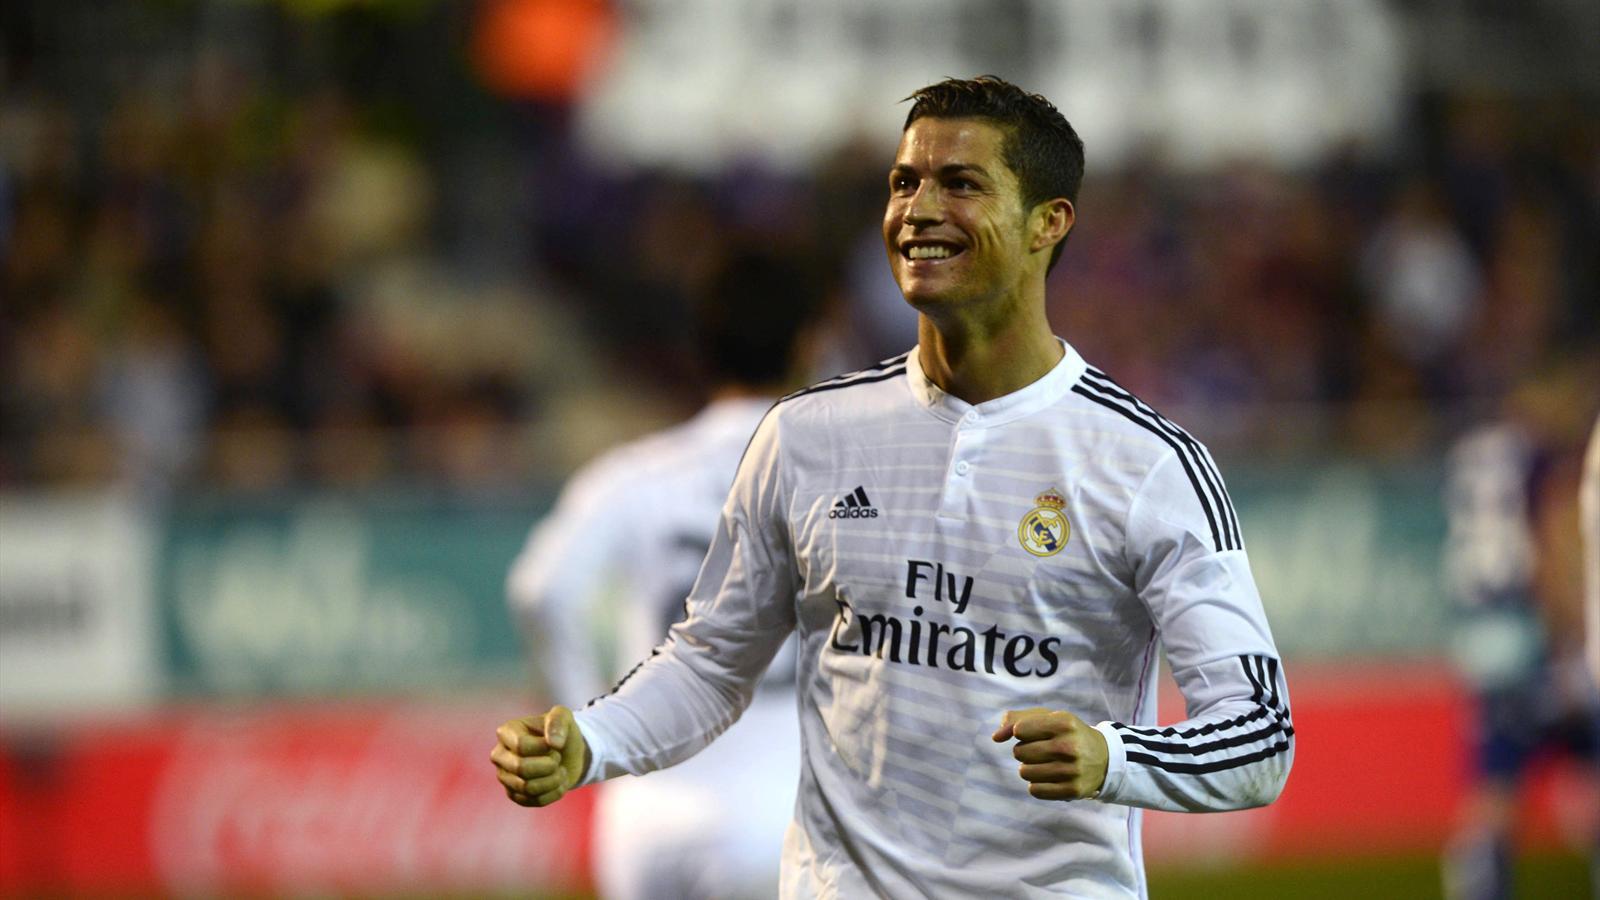 Cristiano Ronaldo leads Real Madrid to victory over Eibar - Liga 2014-2015 - Football ...